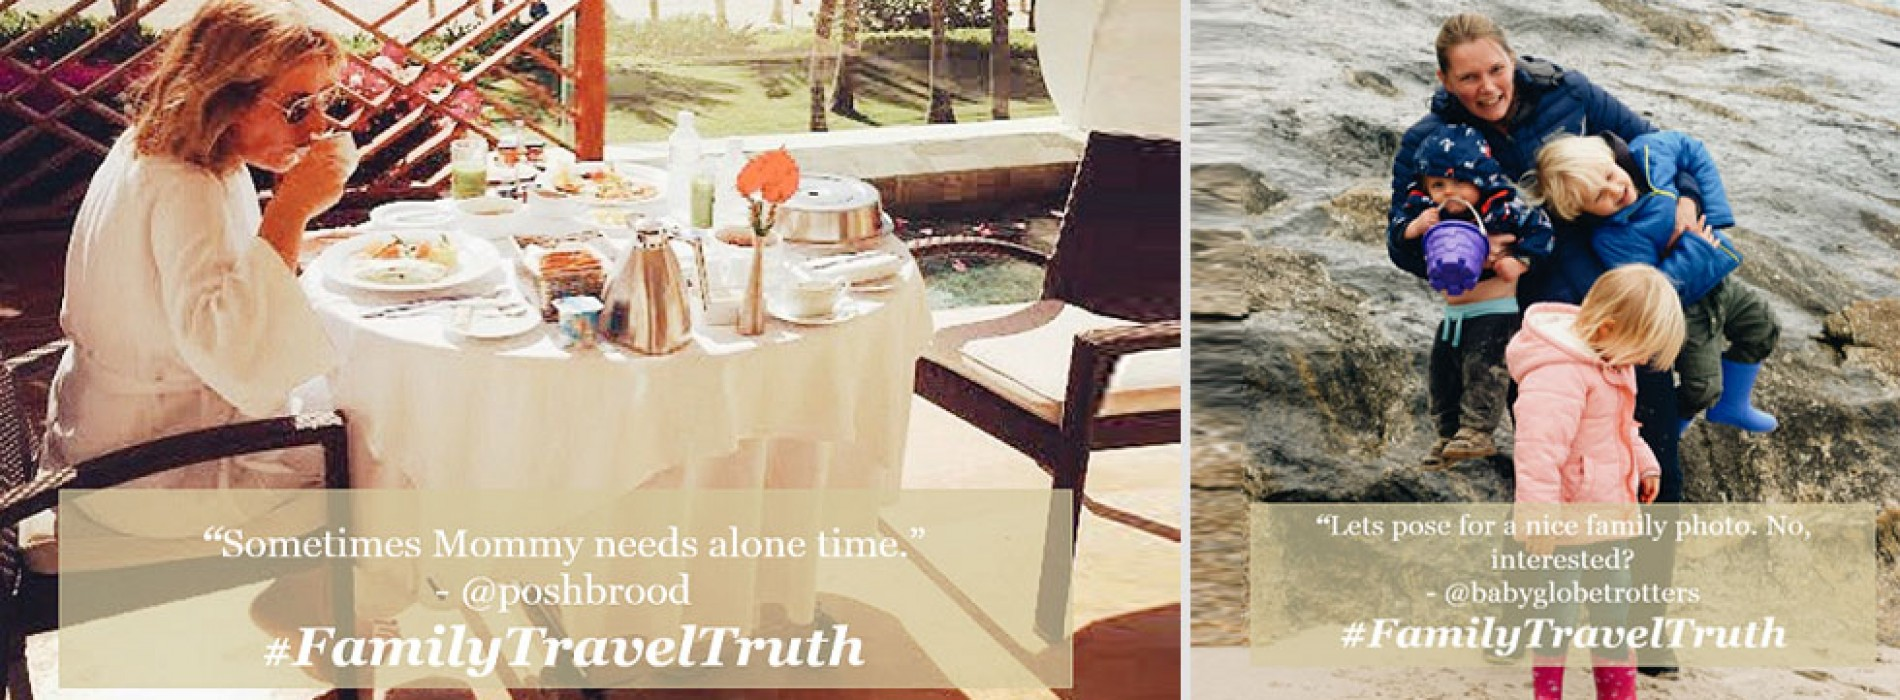 Preferred Hotels & Resorts launches #FAMILYTRAVELTRUTH INSTAGRAM contest